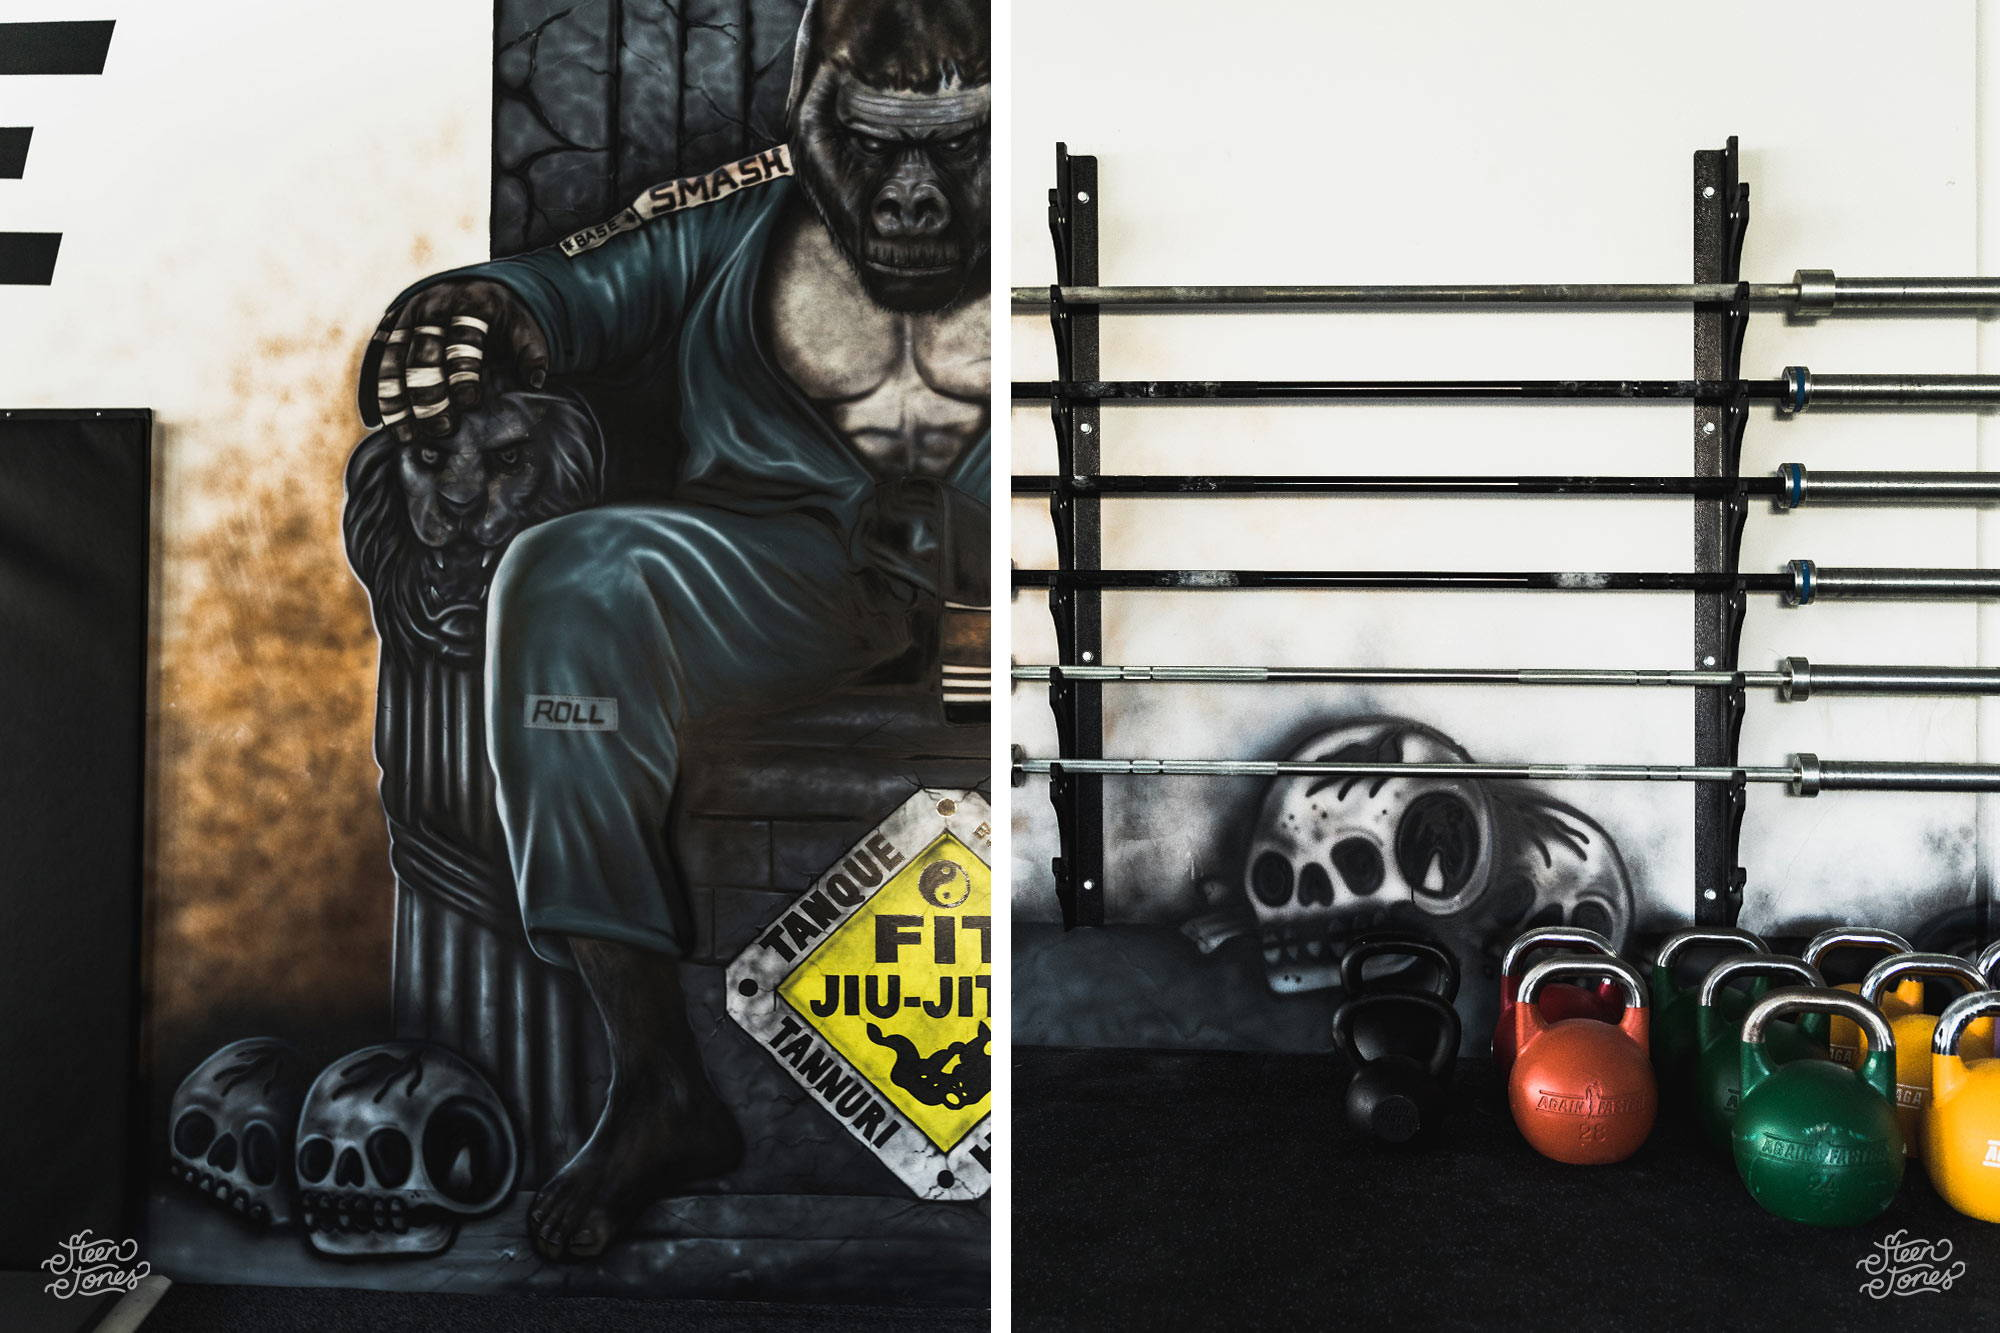 Steen Jones tattoo street artist Base Training Centre Ian Lowe Brisbane mural